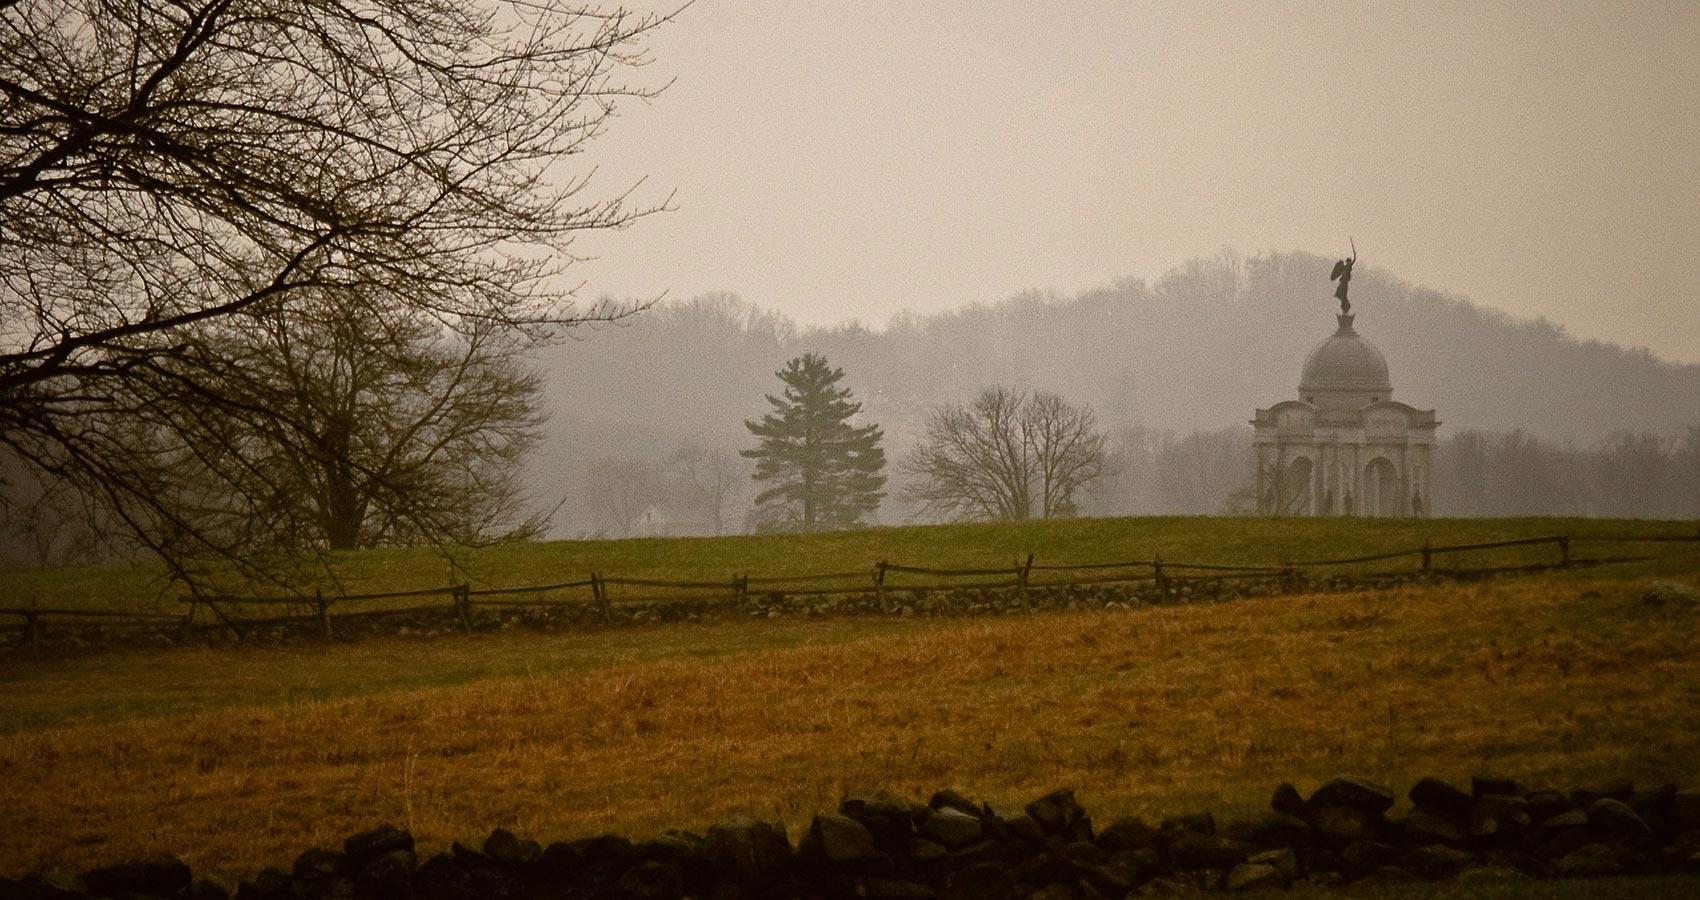 Gettysburg, a poem written by Brad Osborne at Spillwords.com